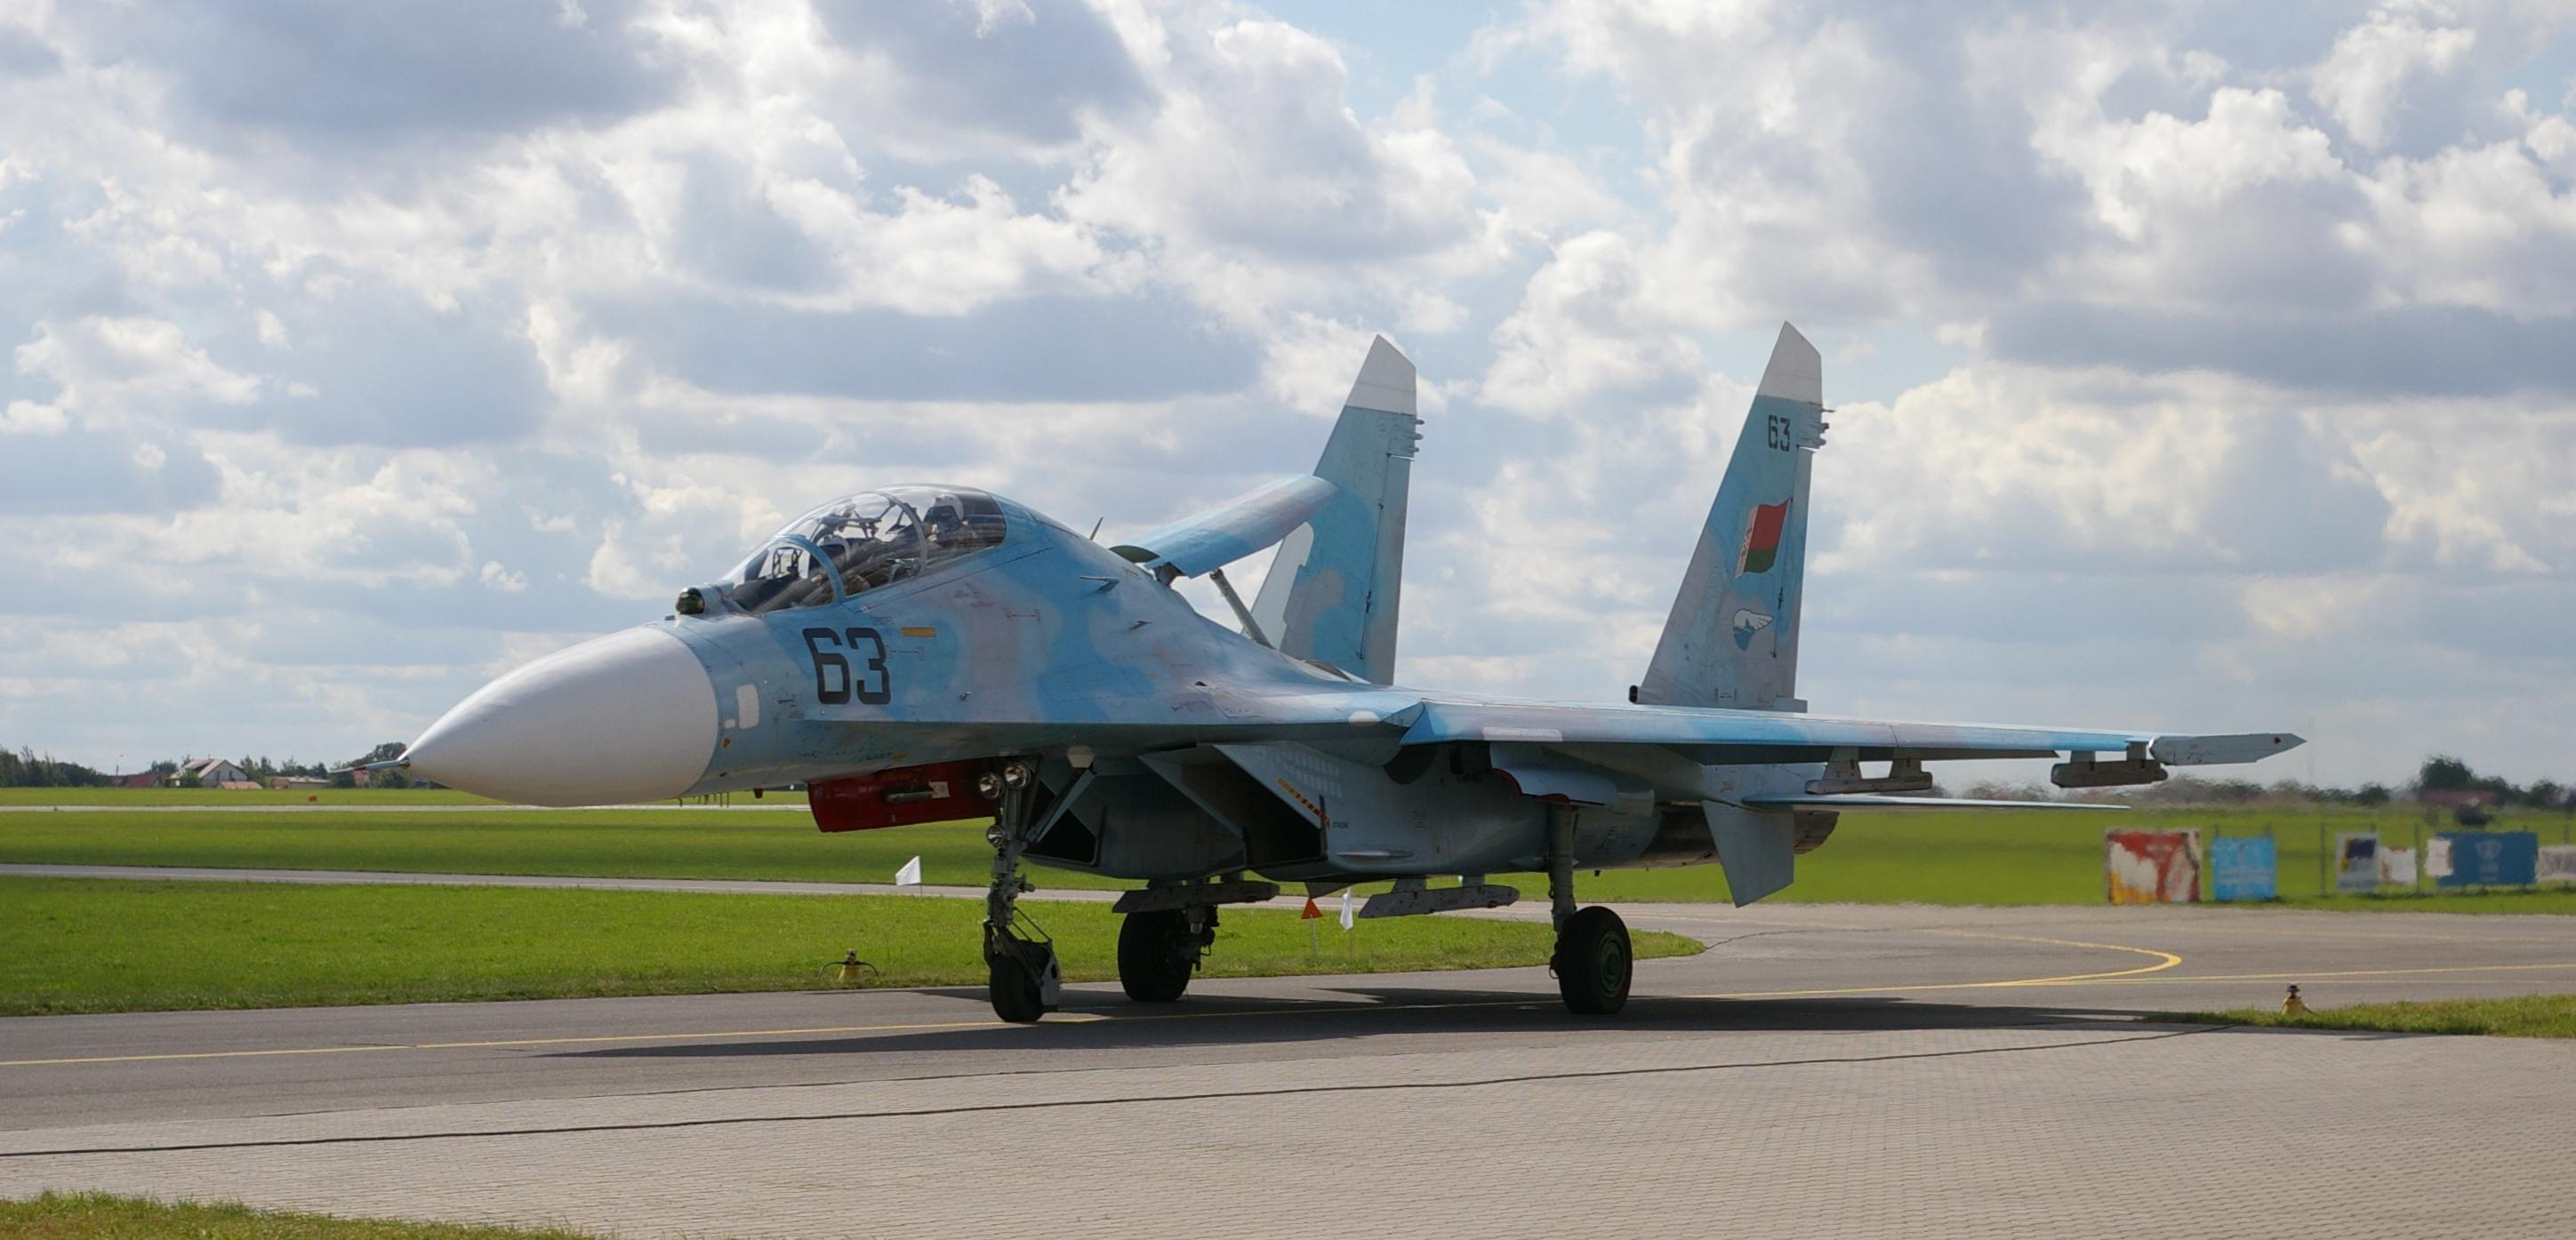 Su 33 (航空機)の画像 p1_23